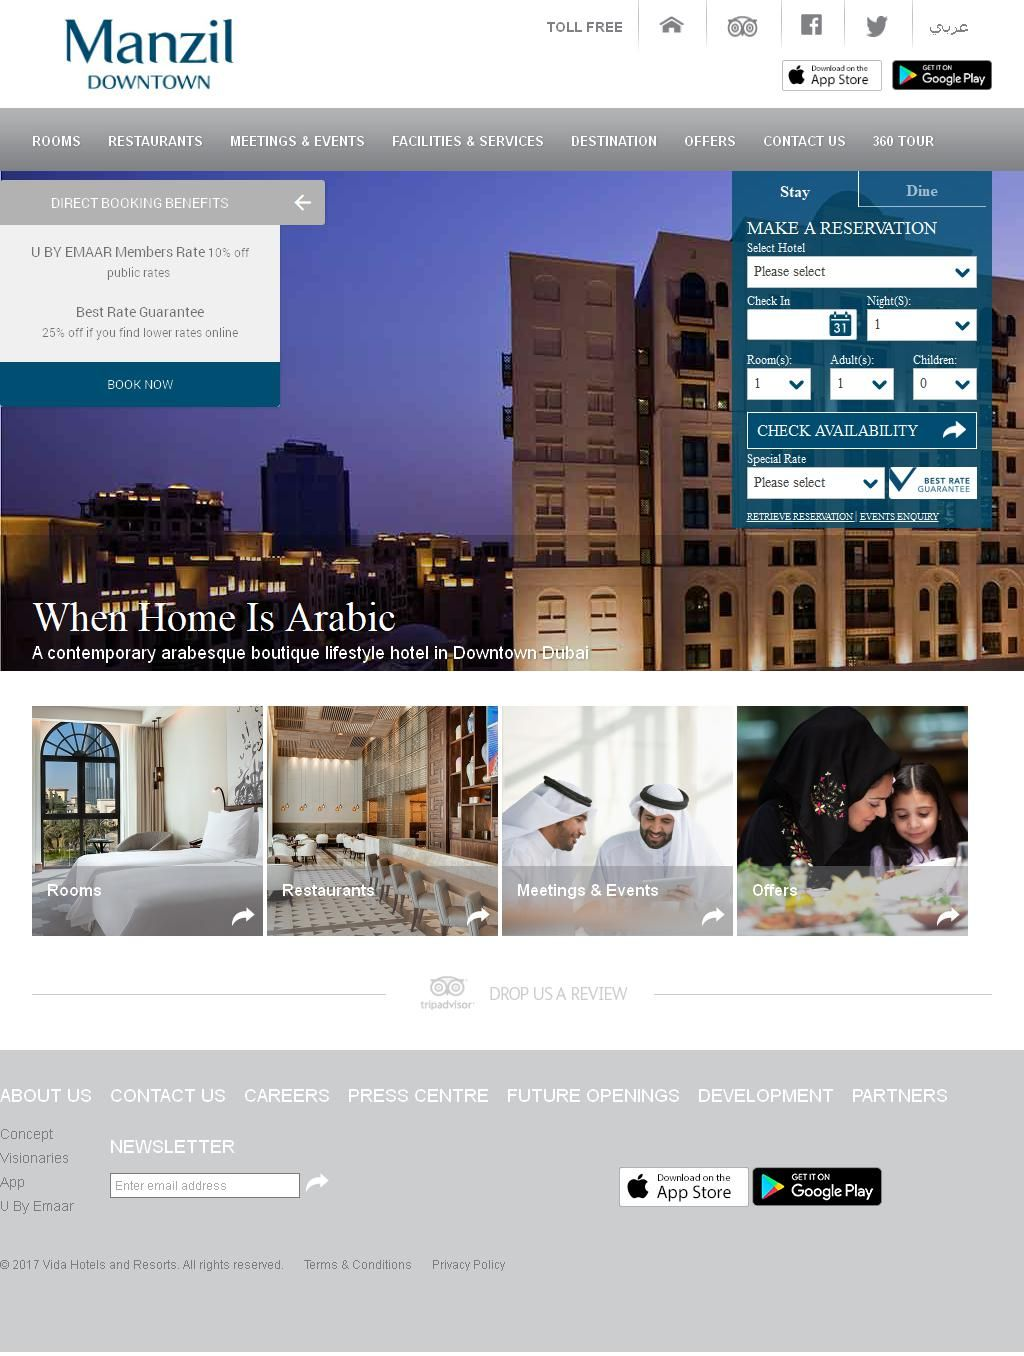 The Courtyard Restaurant Al Manzil Hotel, 32, Mohammed Bin